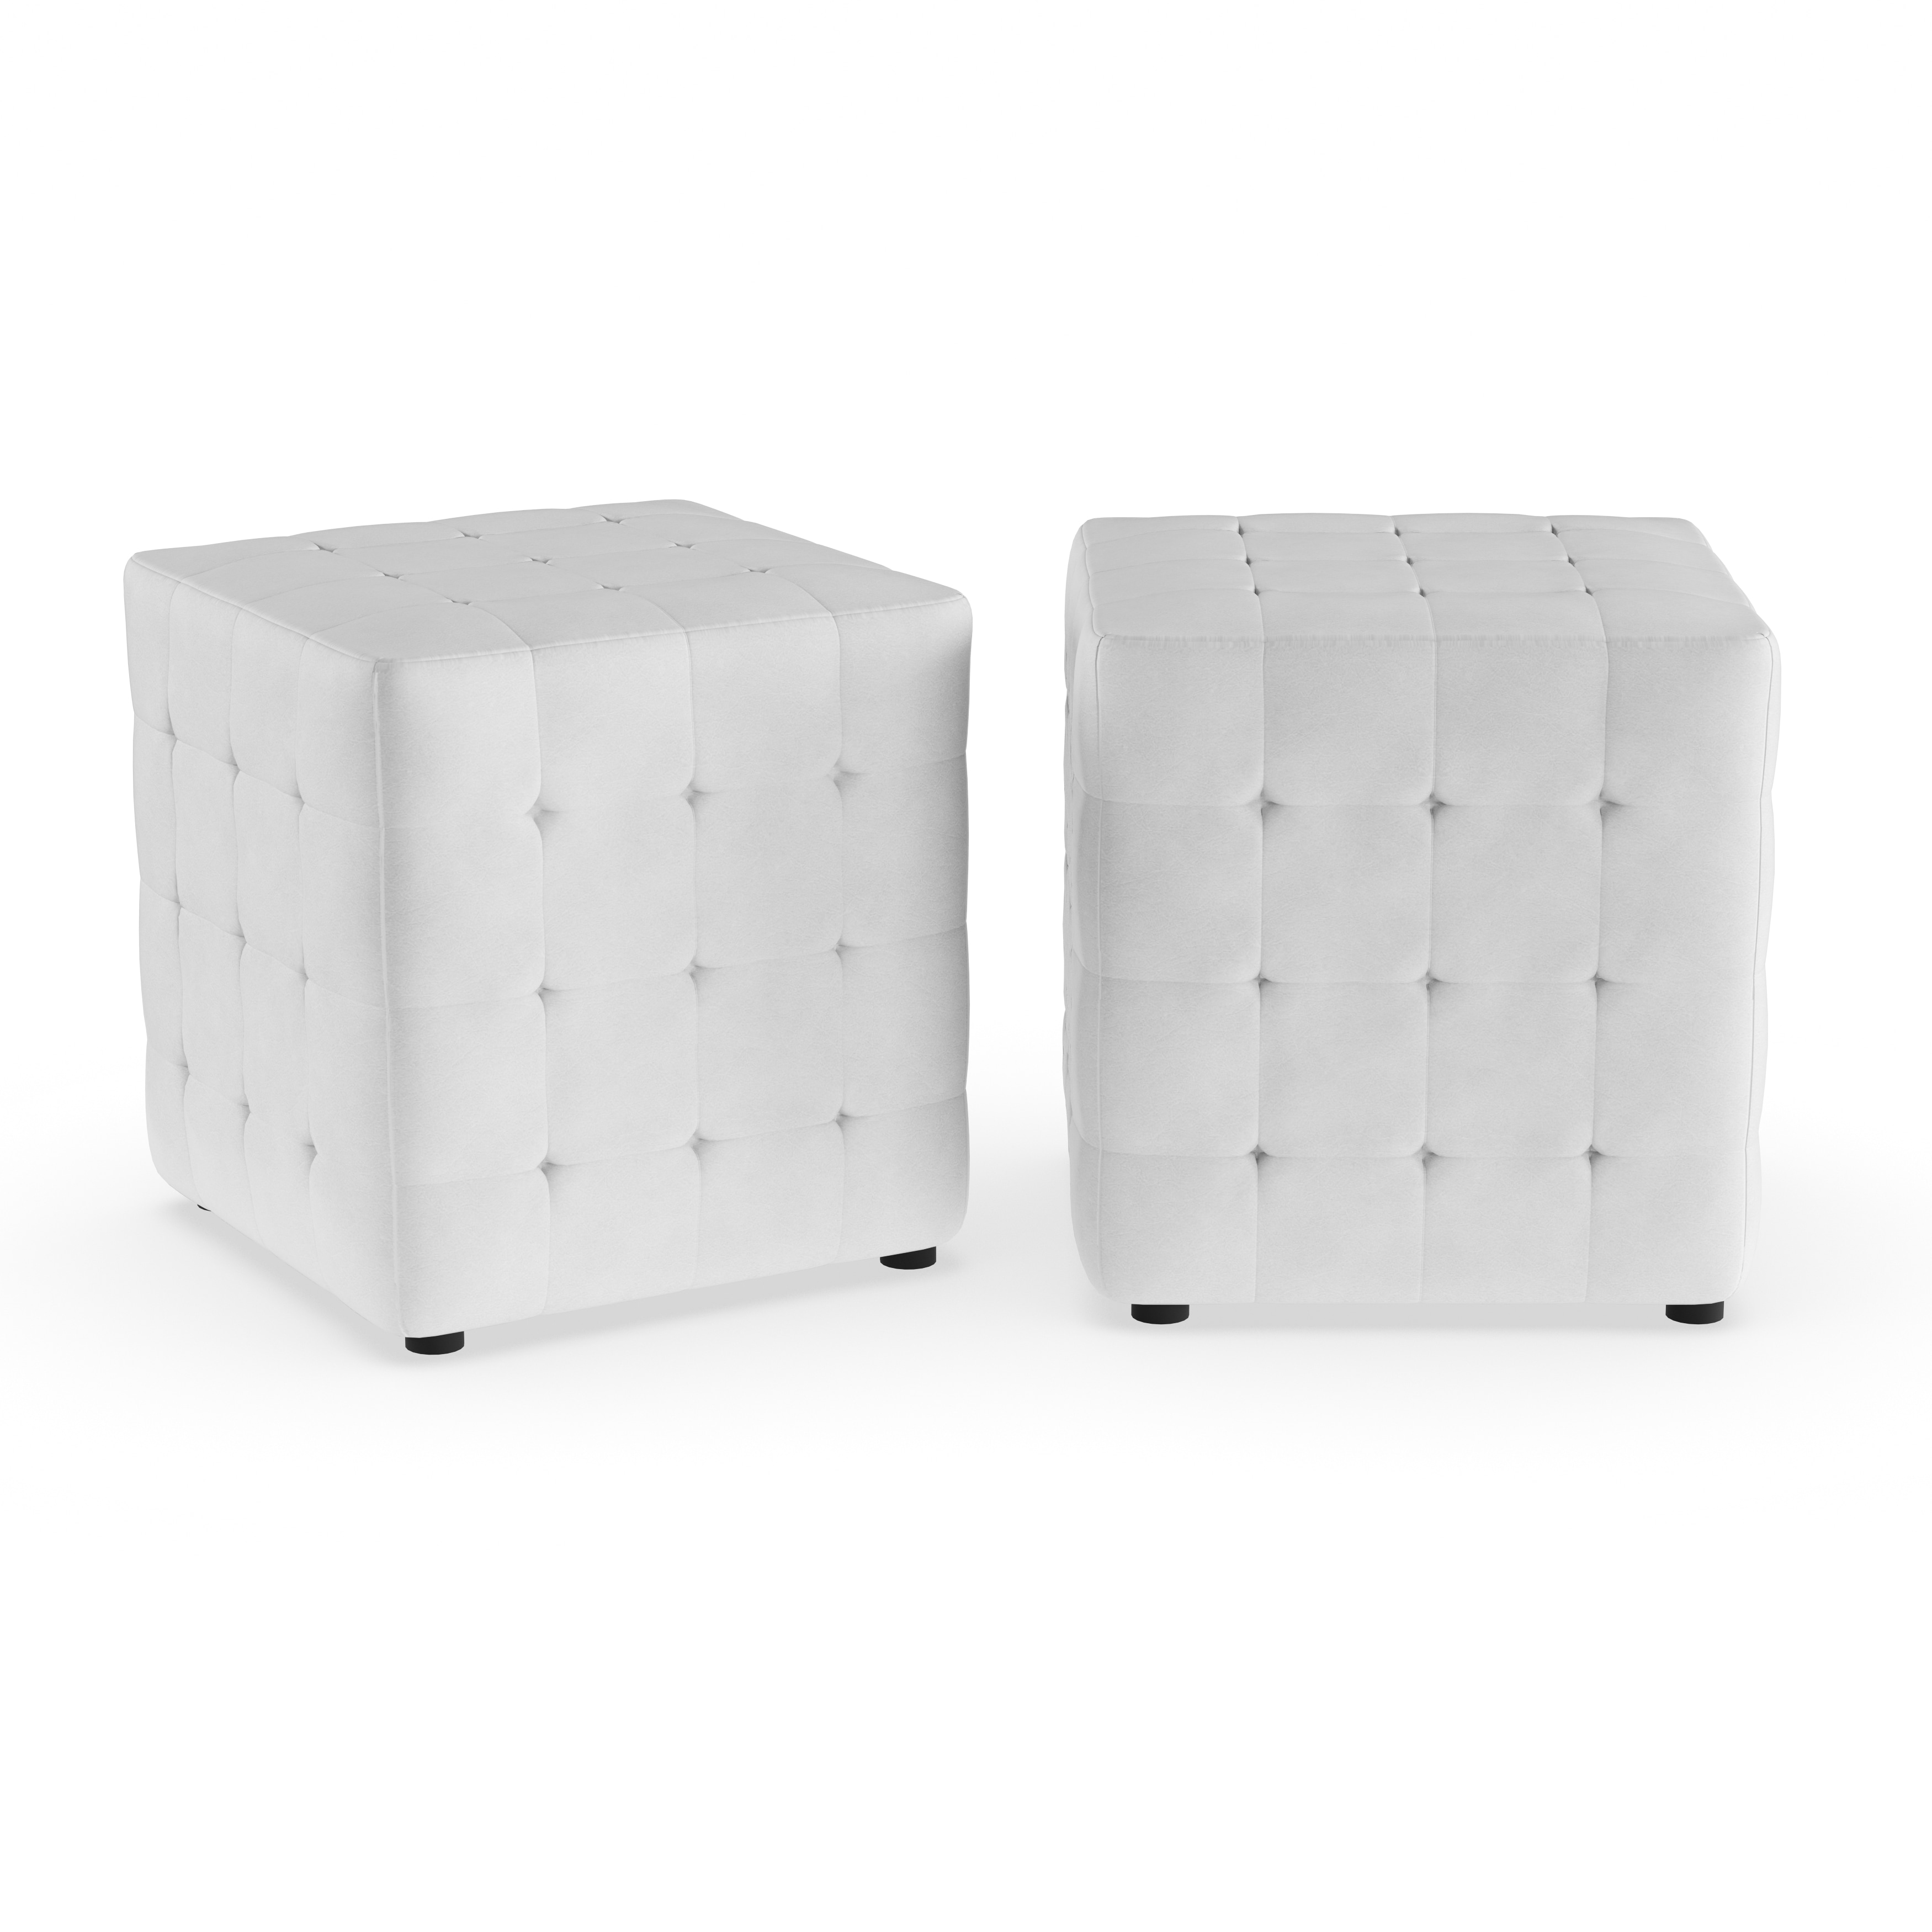 Swell Porch Den Las Olas White Cube Ottoman Set Of 2 Inzonedesignstudio Interior Chair Design Inzonedesignstudiocom